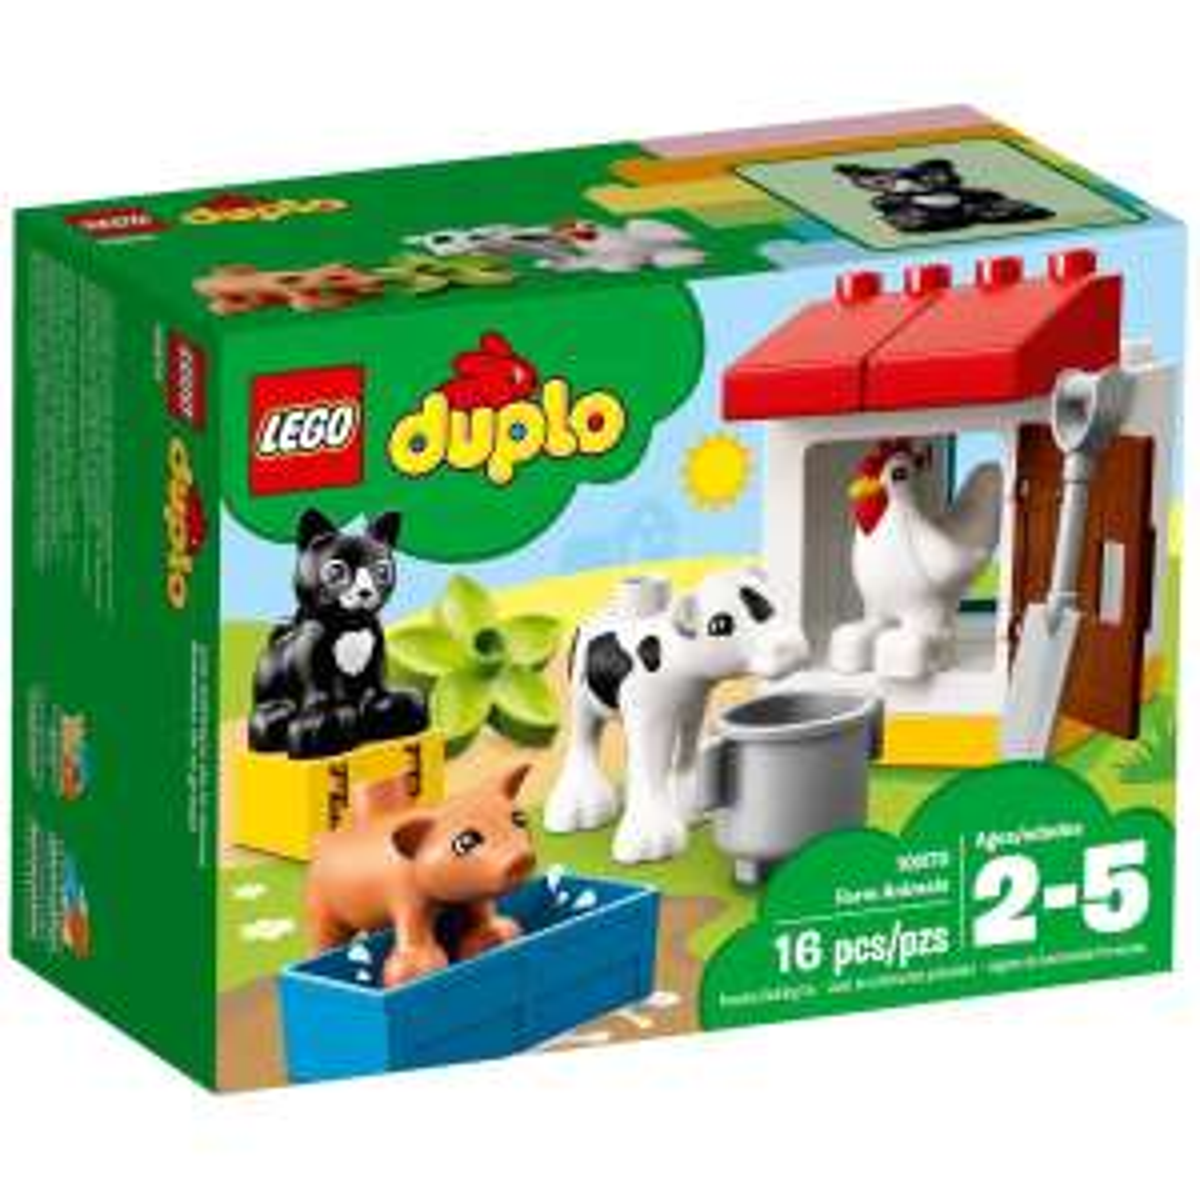 Lego Duplo 10870 farm animals £3 instore at Sainsbury's London